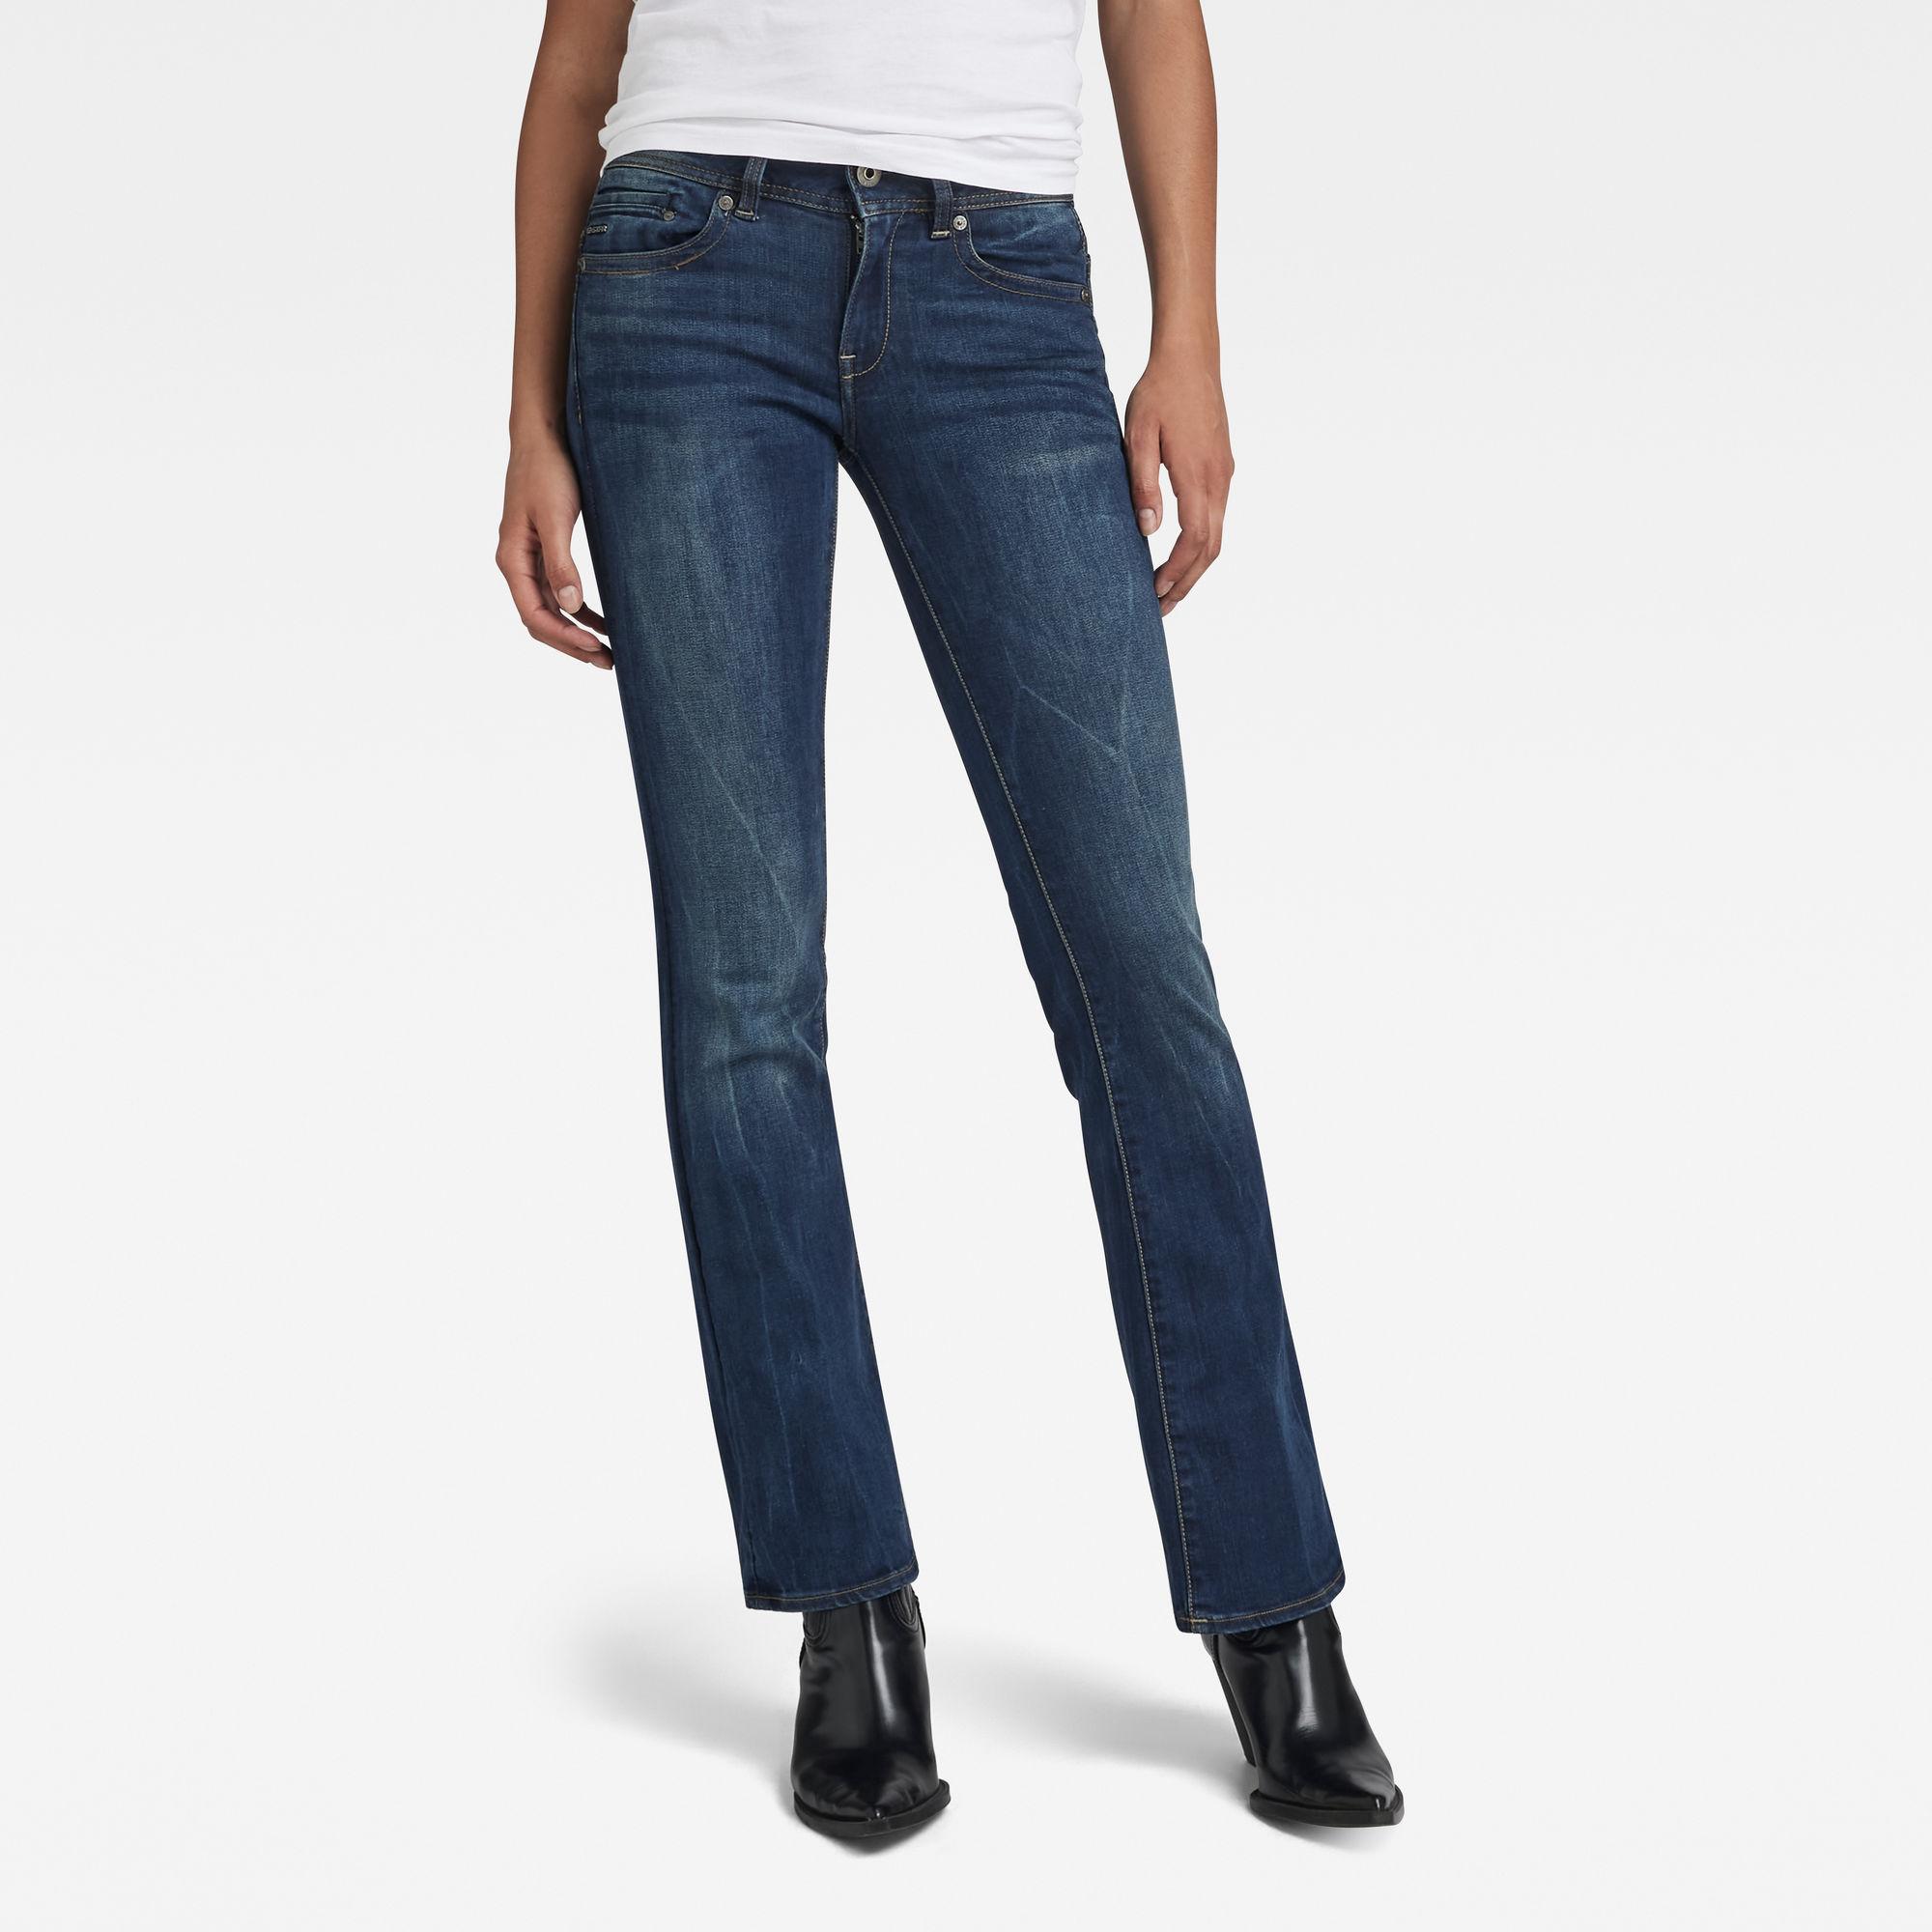 G-Star RAW Dames Midge Bootcut Jeans Zwart